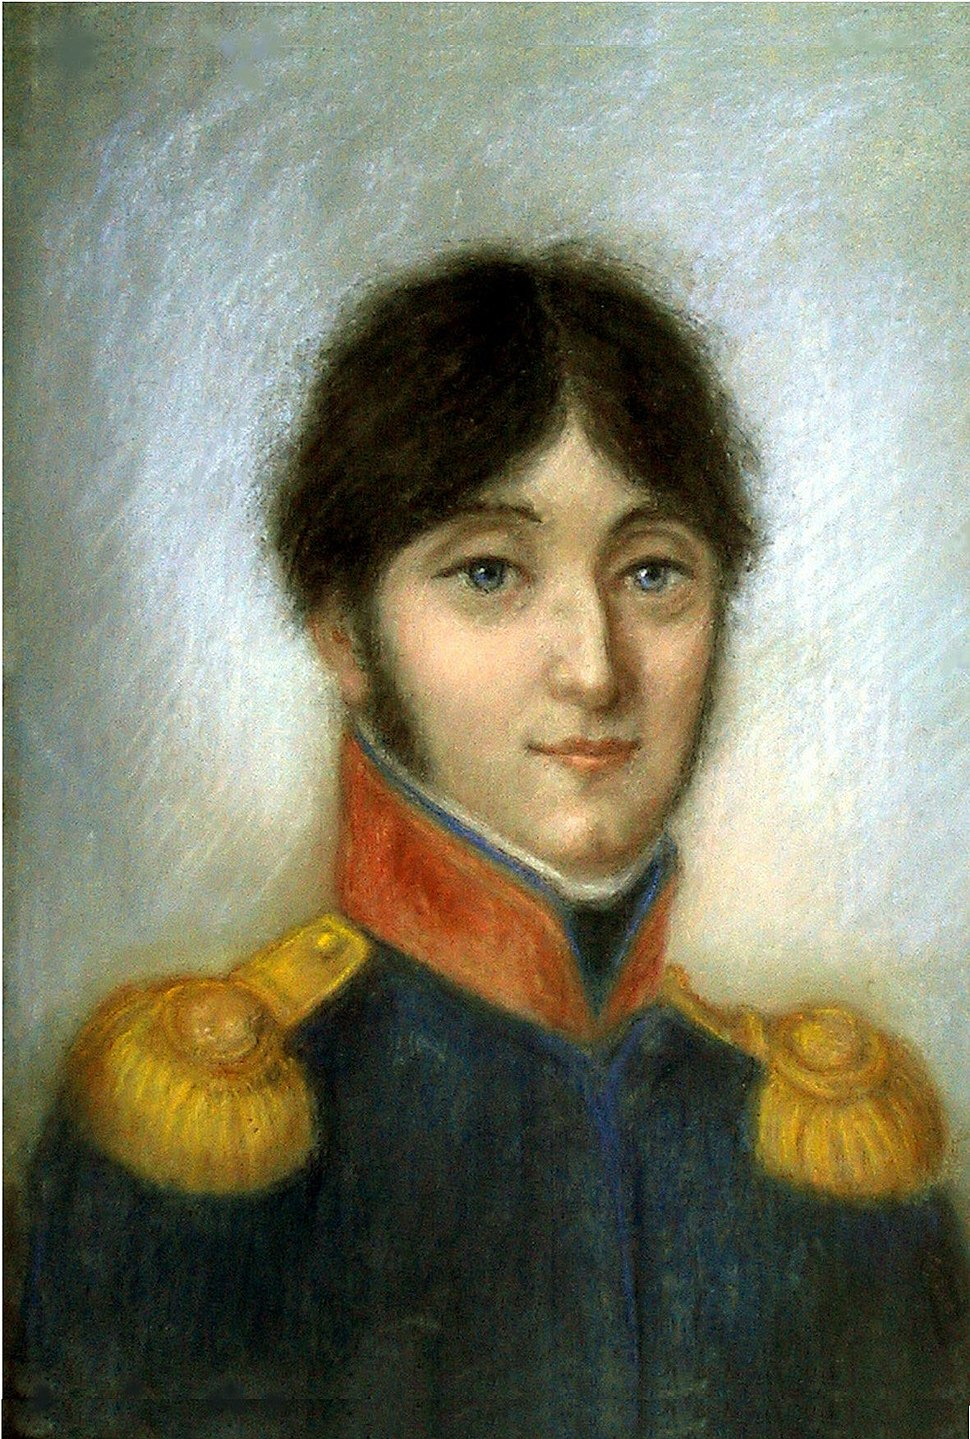 Jean-Baptiste Girard